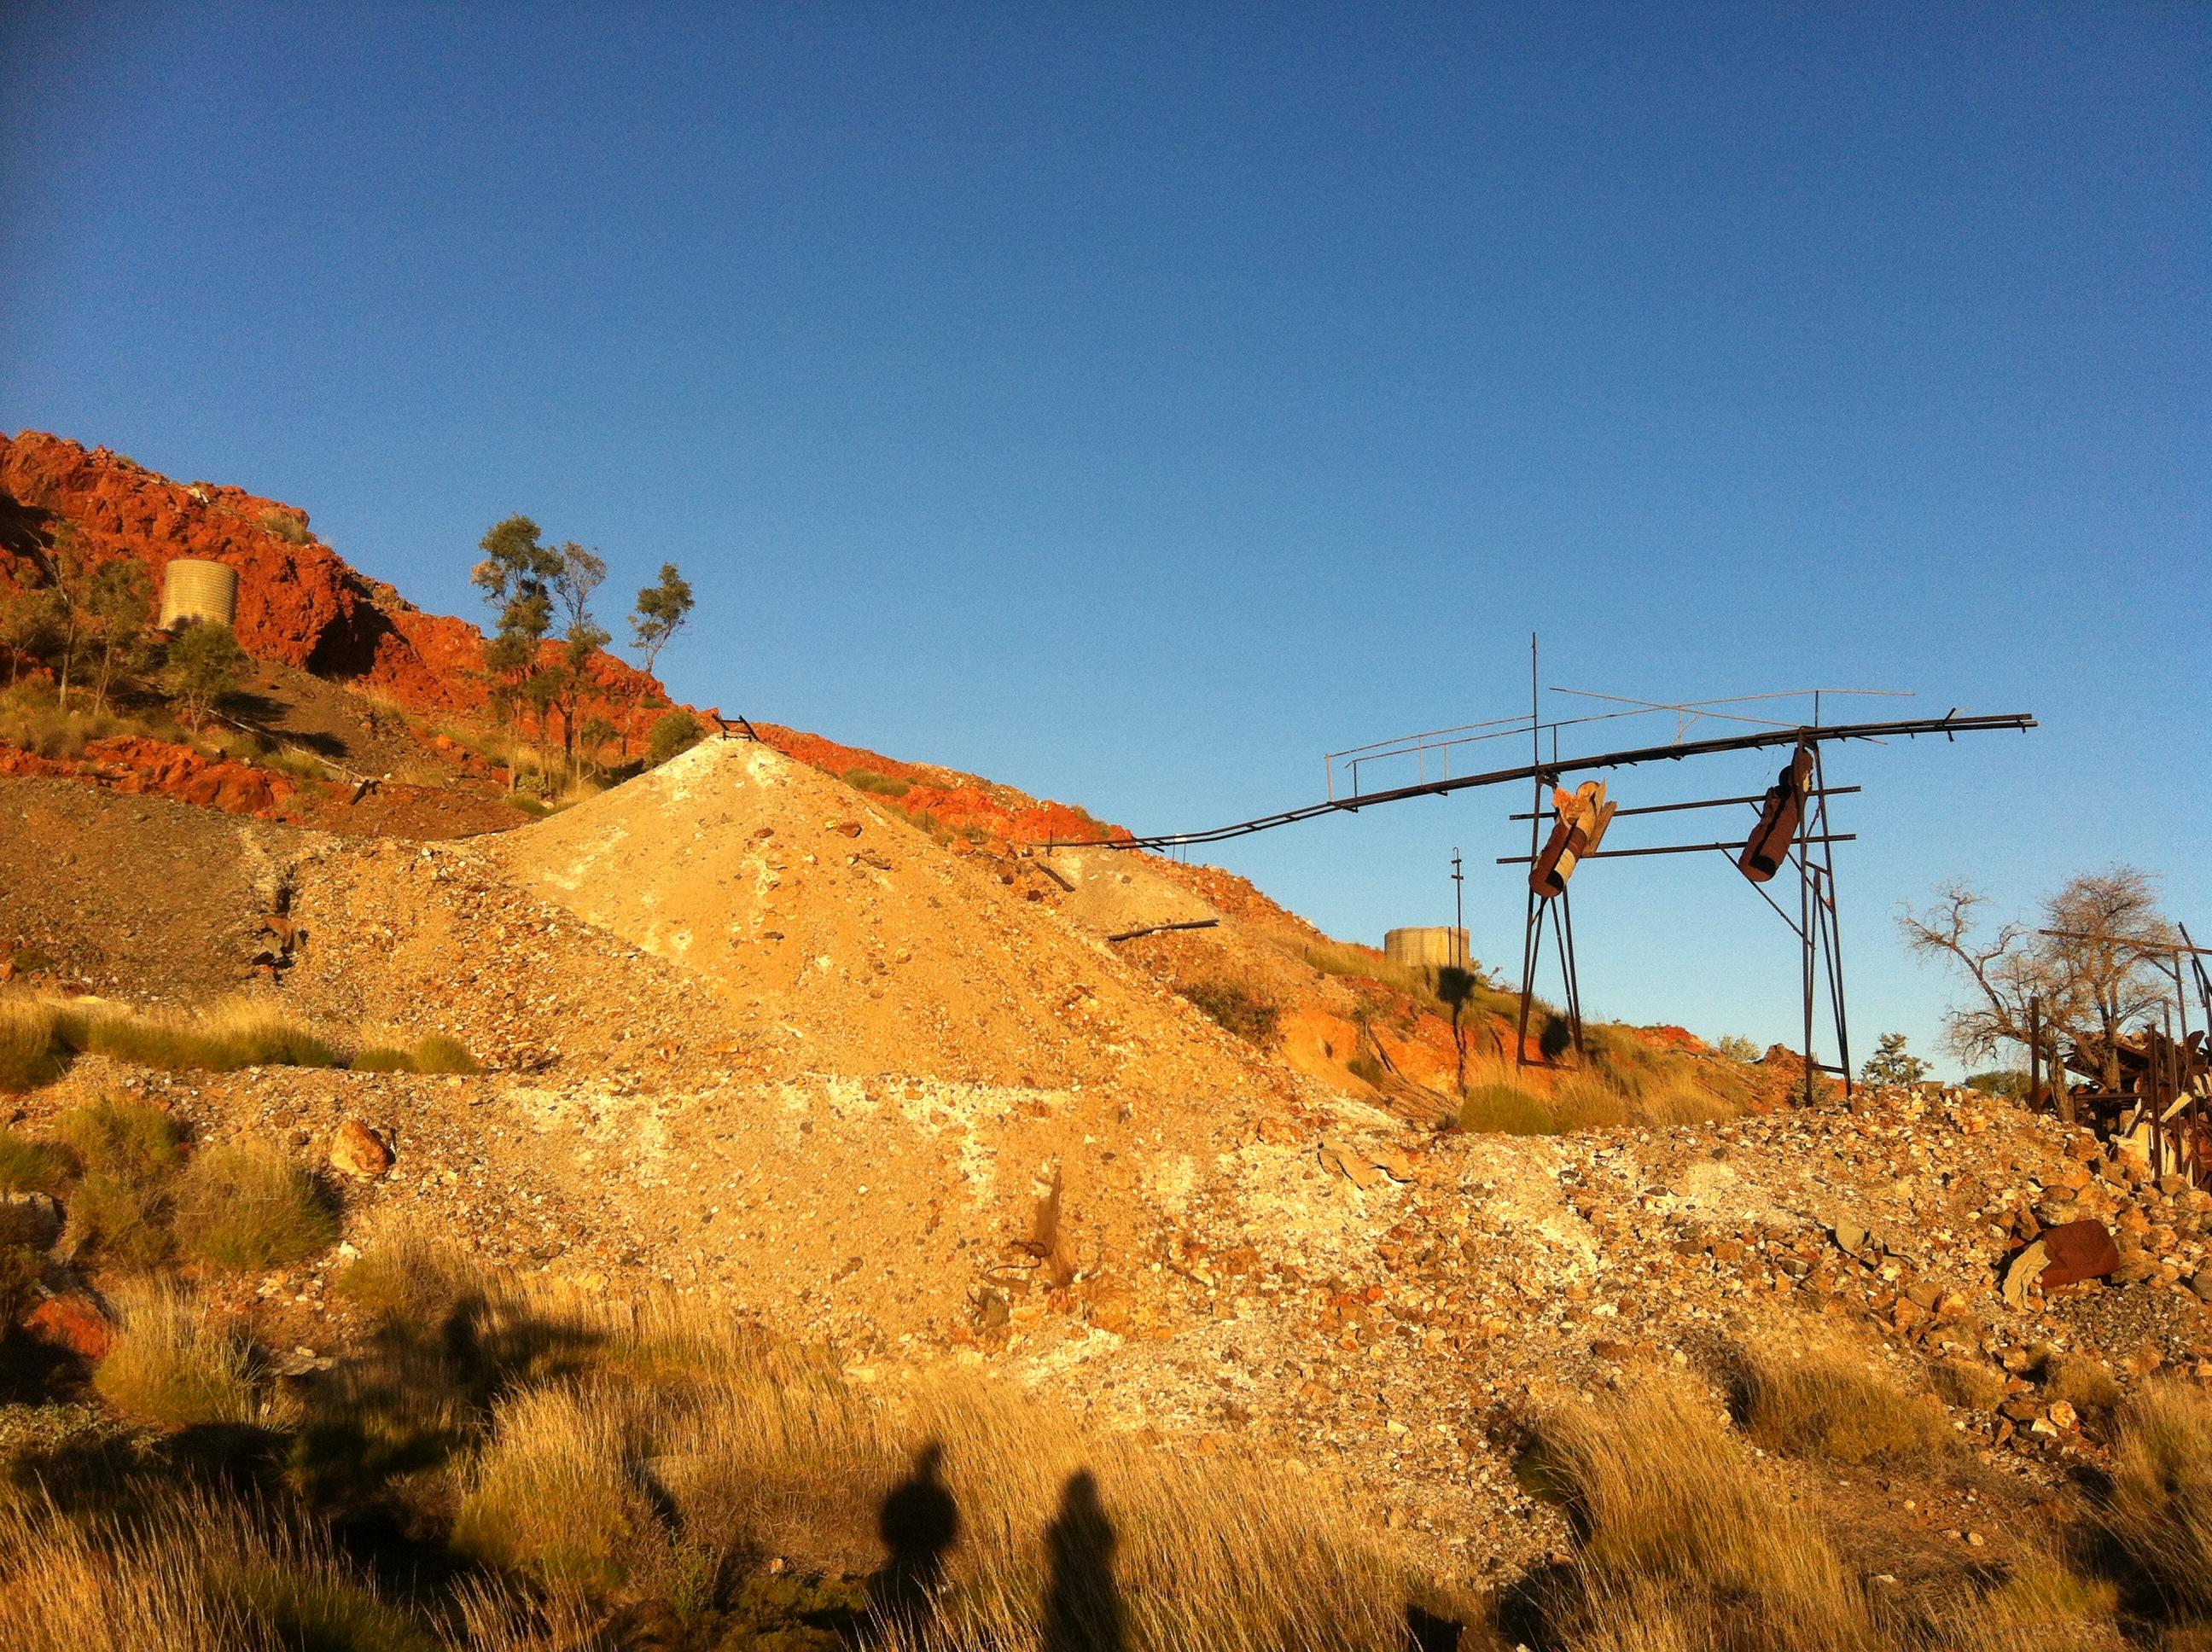 Ragged Hill #3 East PIlbara WA